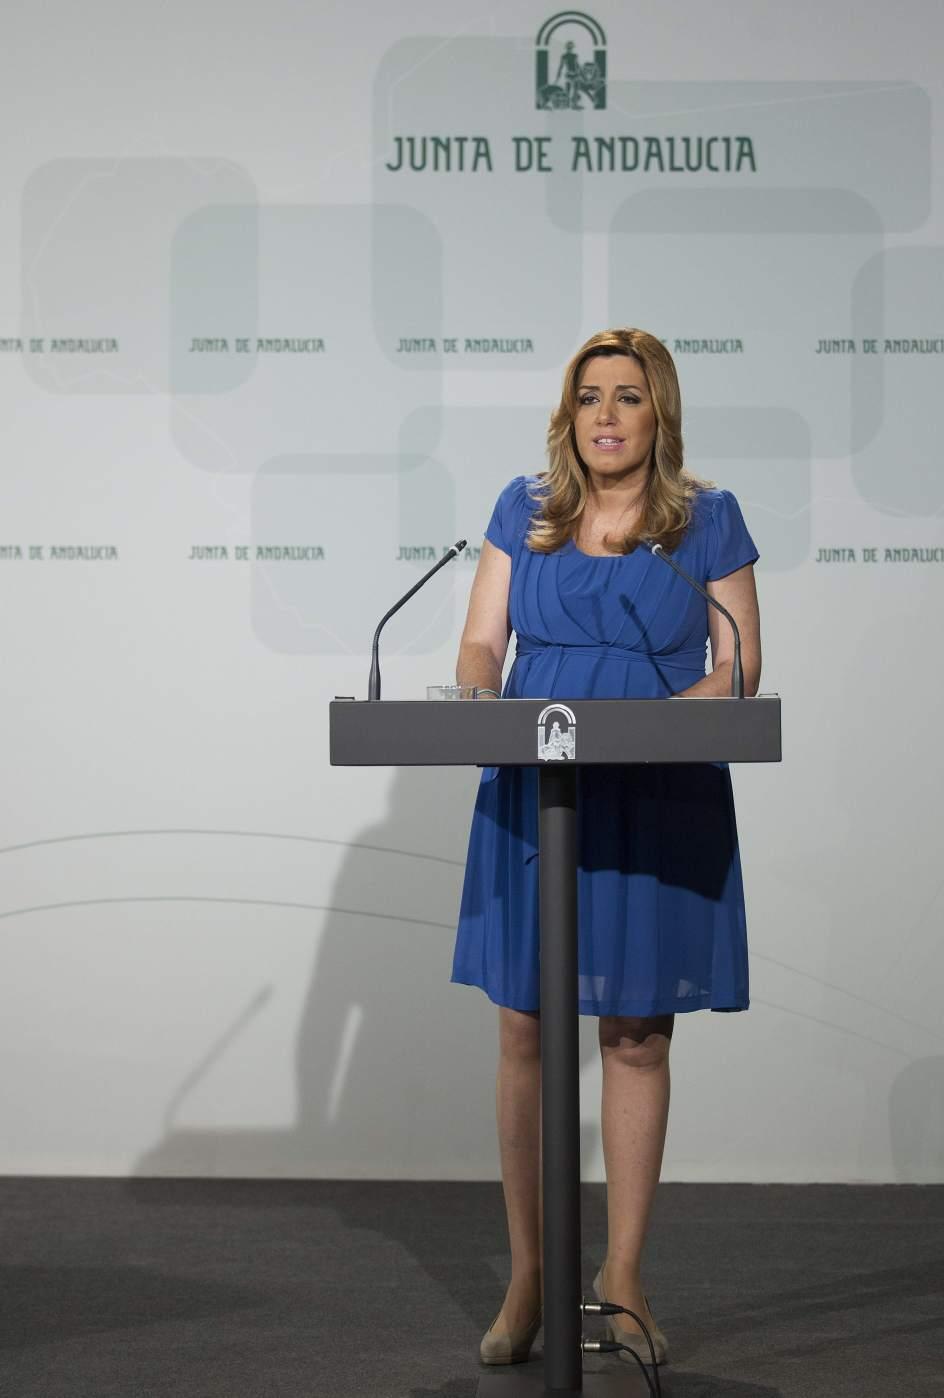 La junta de andaluc a tiene 238 altos cargos 222 for Oficina junta de andalucia